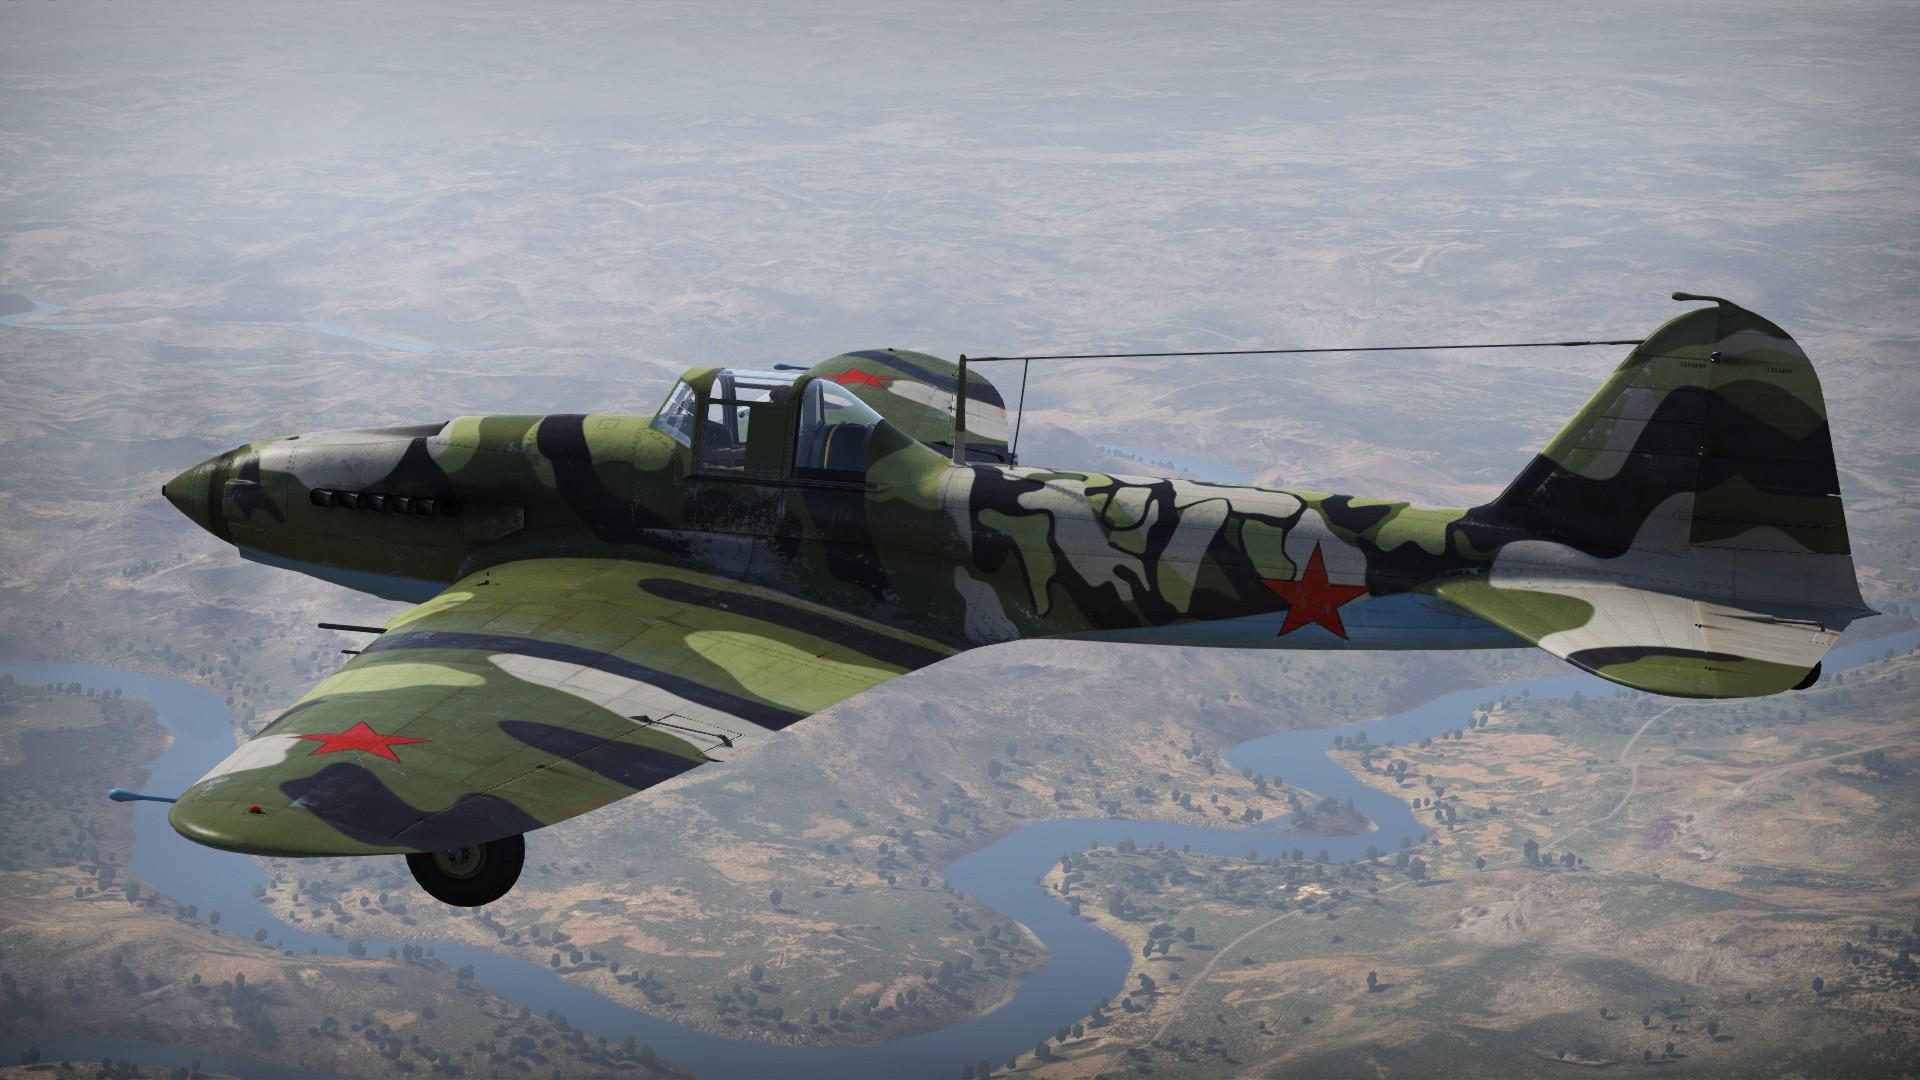 Легендарный «летающий танк» Ил-2 снова над Берлином